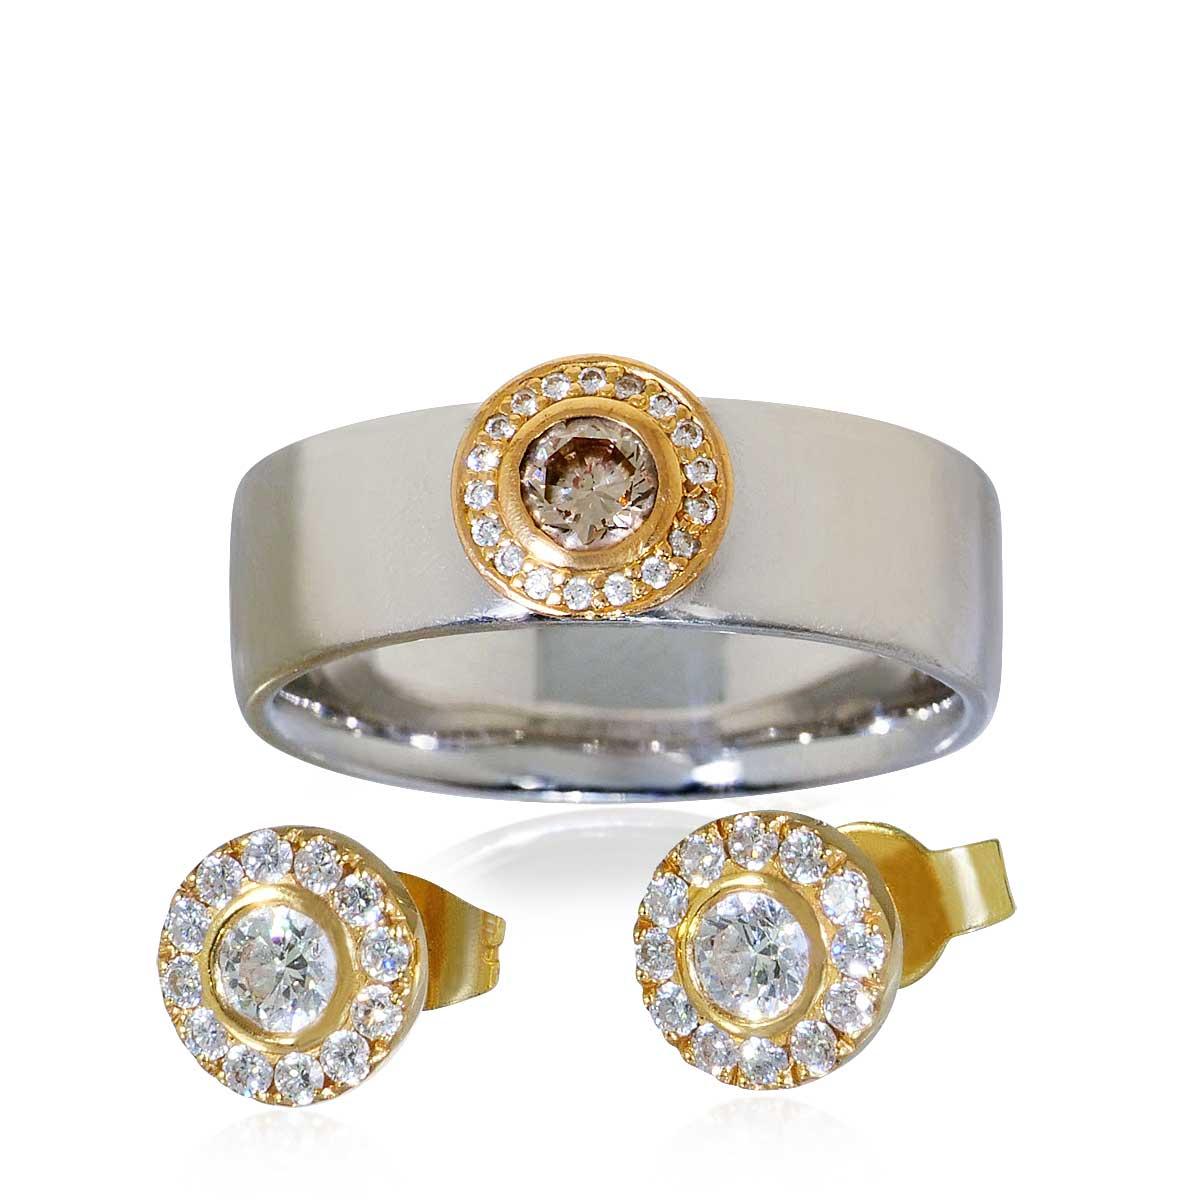 memento mori ring antiker memento mori ring goldring mit. Black Bedroom Furniture Sets. Home Design Ideas